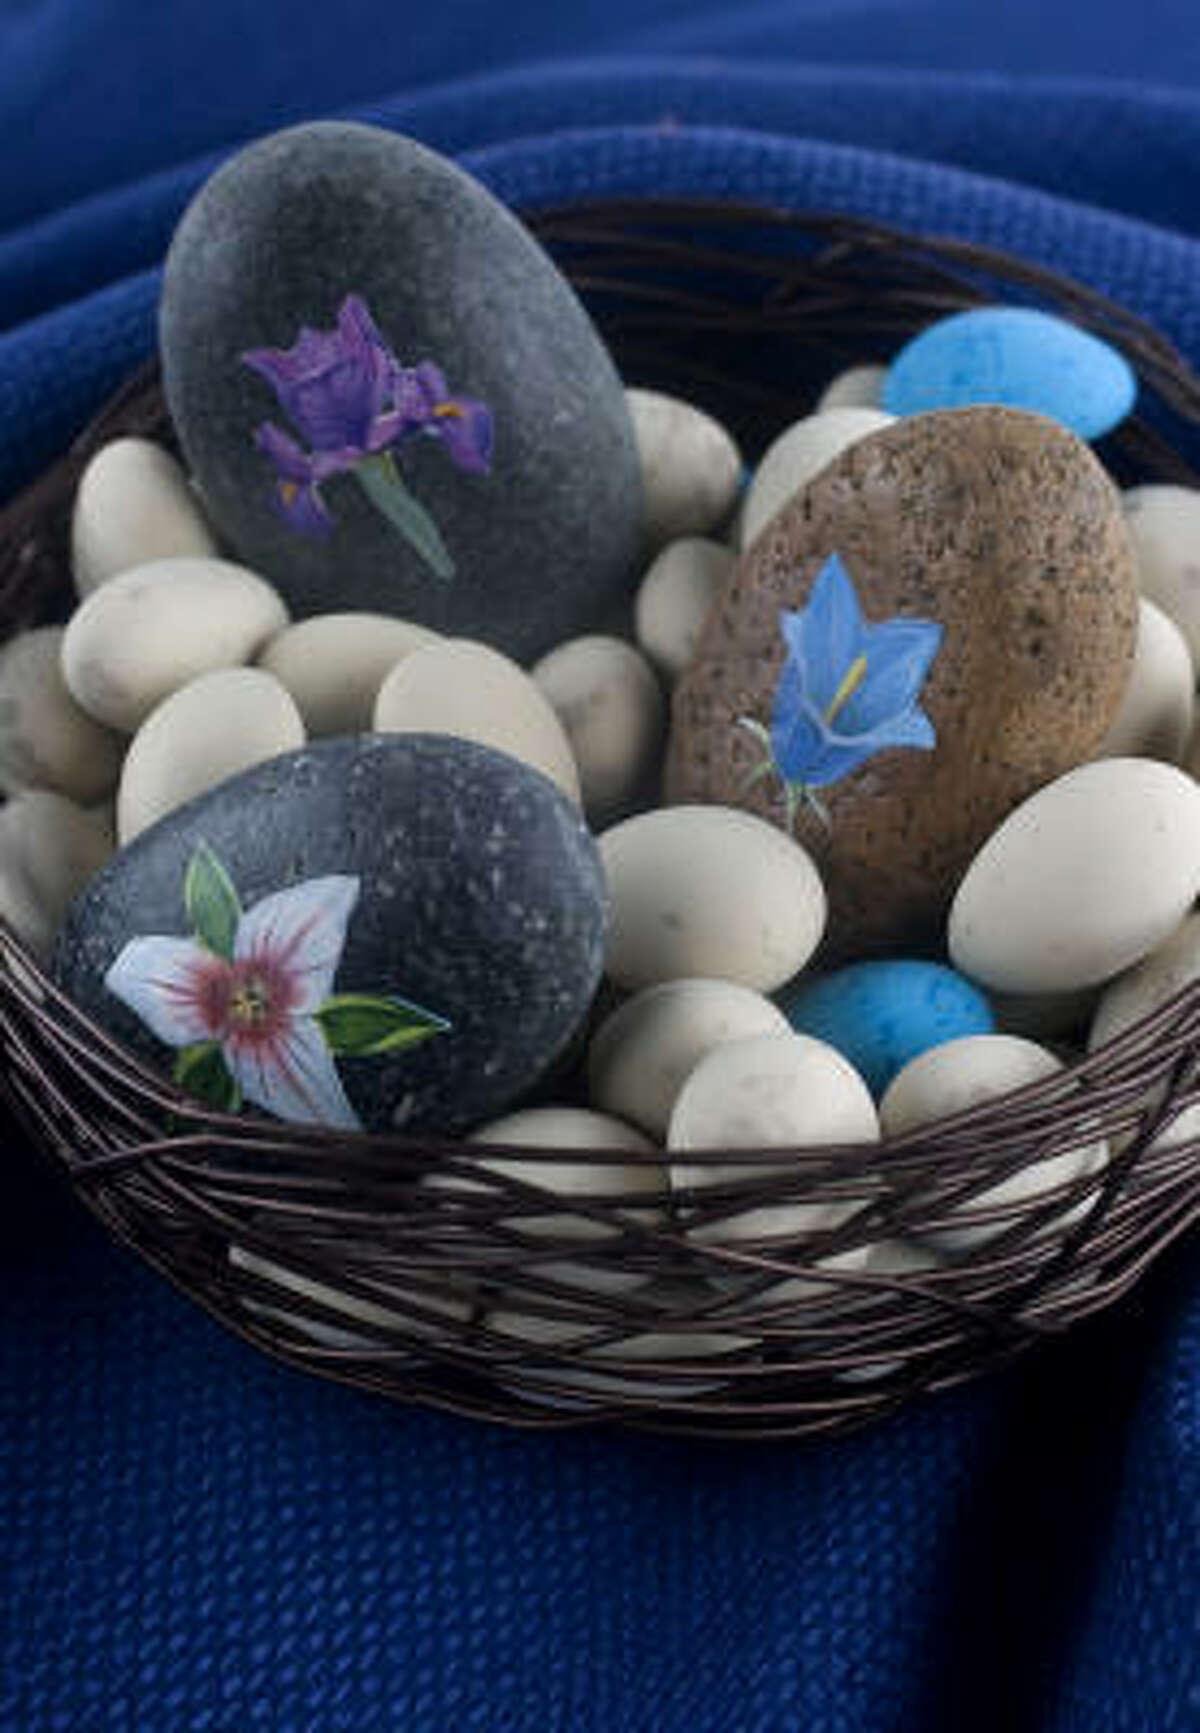 A basket of decoupage rocks makes a pretty tabletop display.